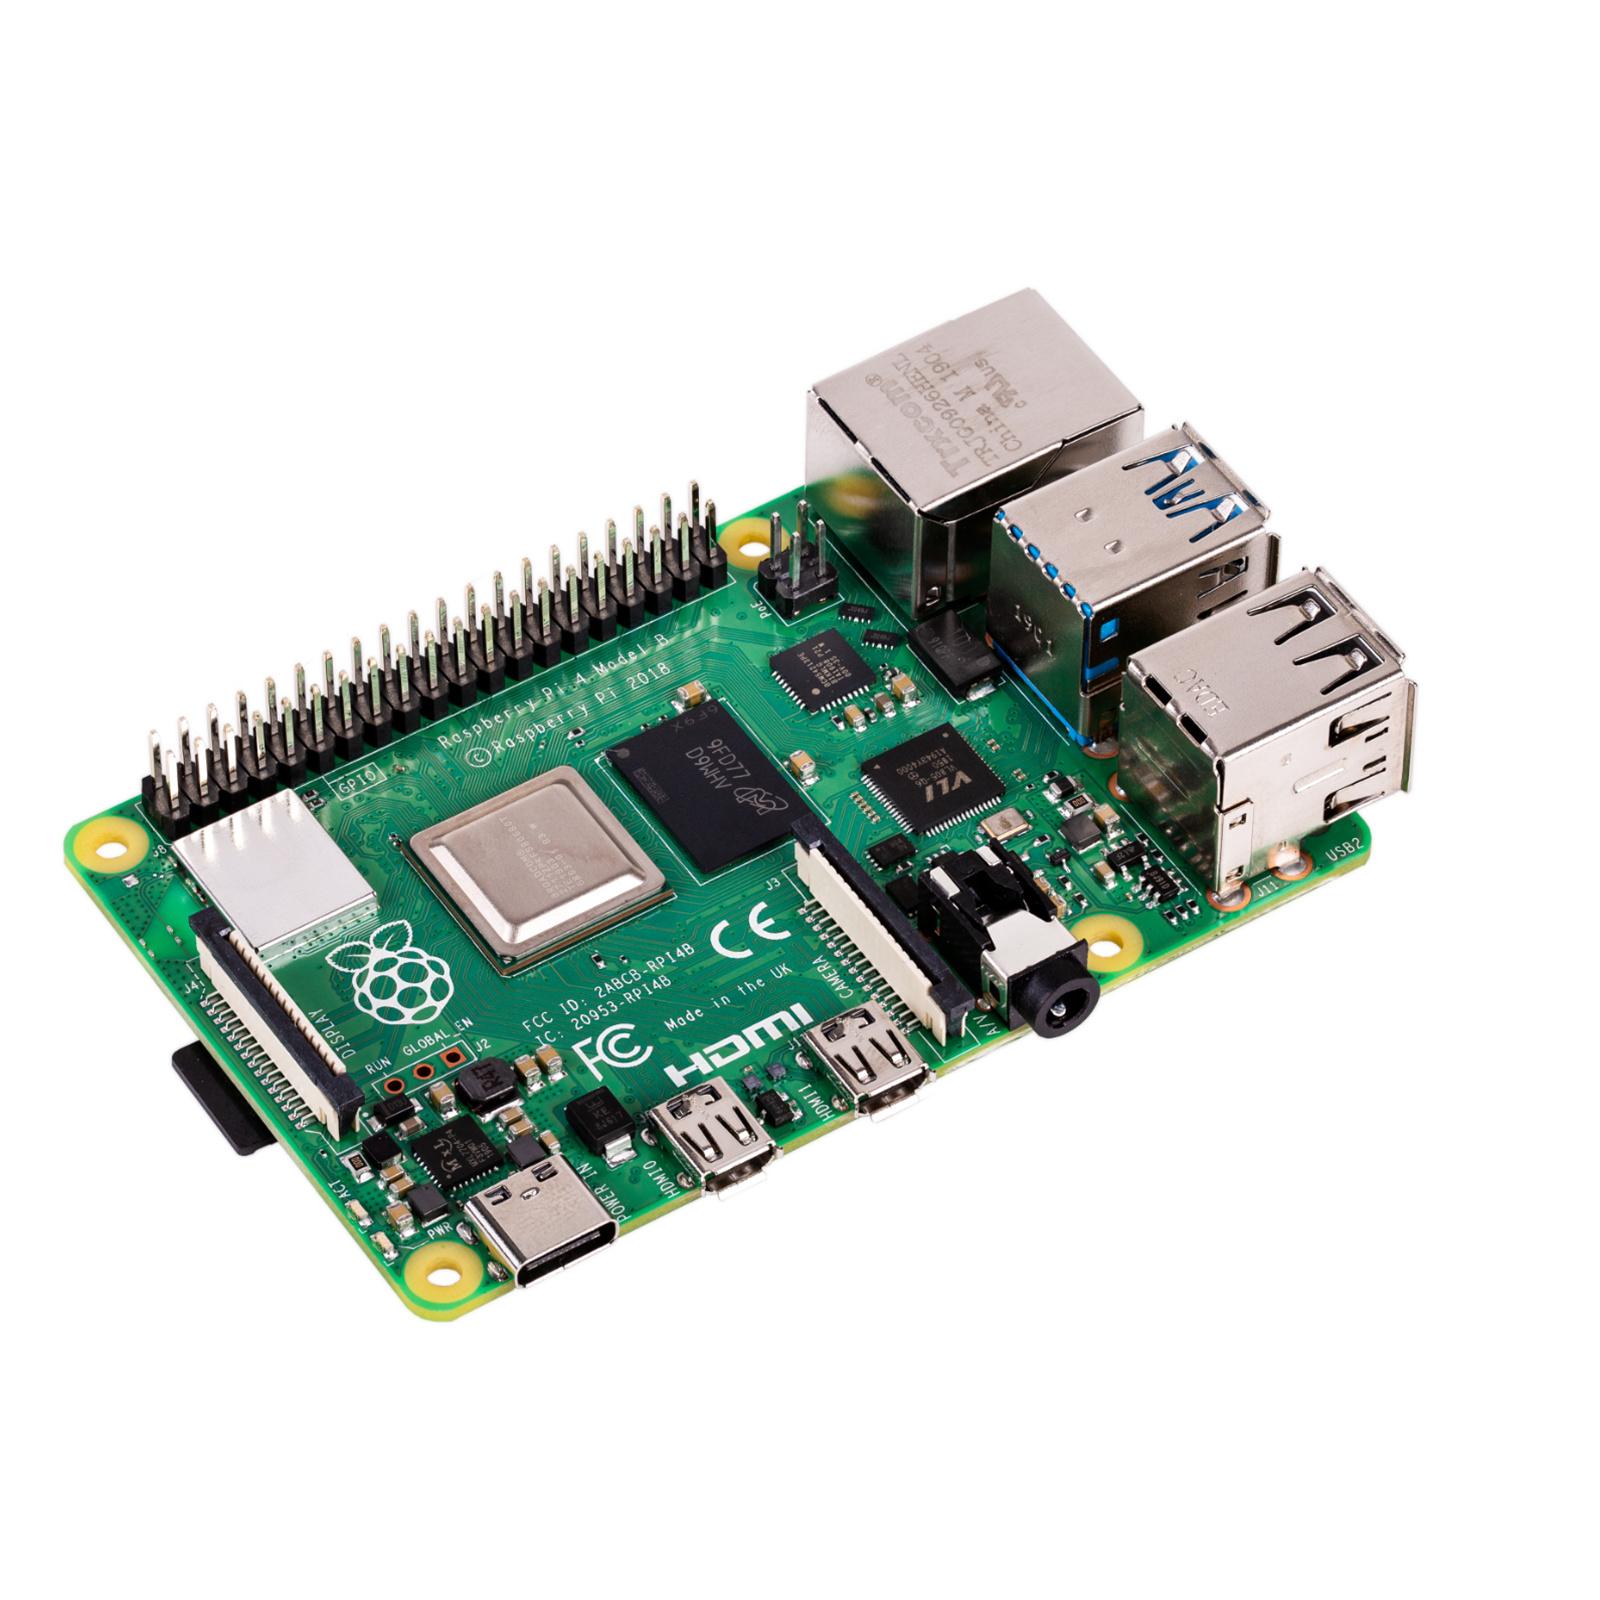 Buy the Raspberry Pi 4 Model B 4GB LPDDR4 FIRST 28nm-Based